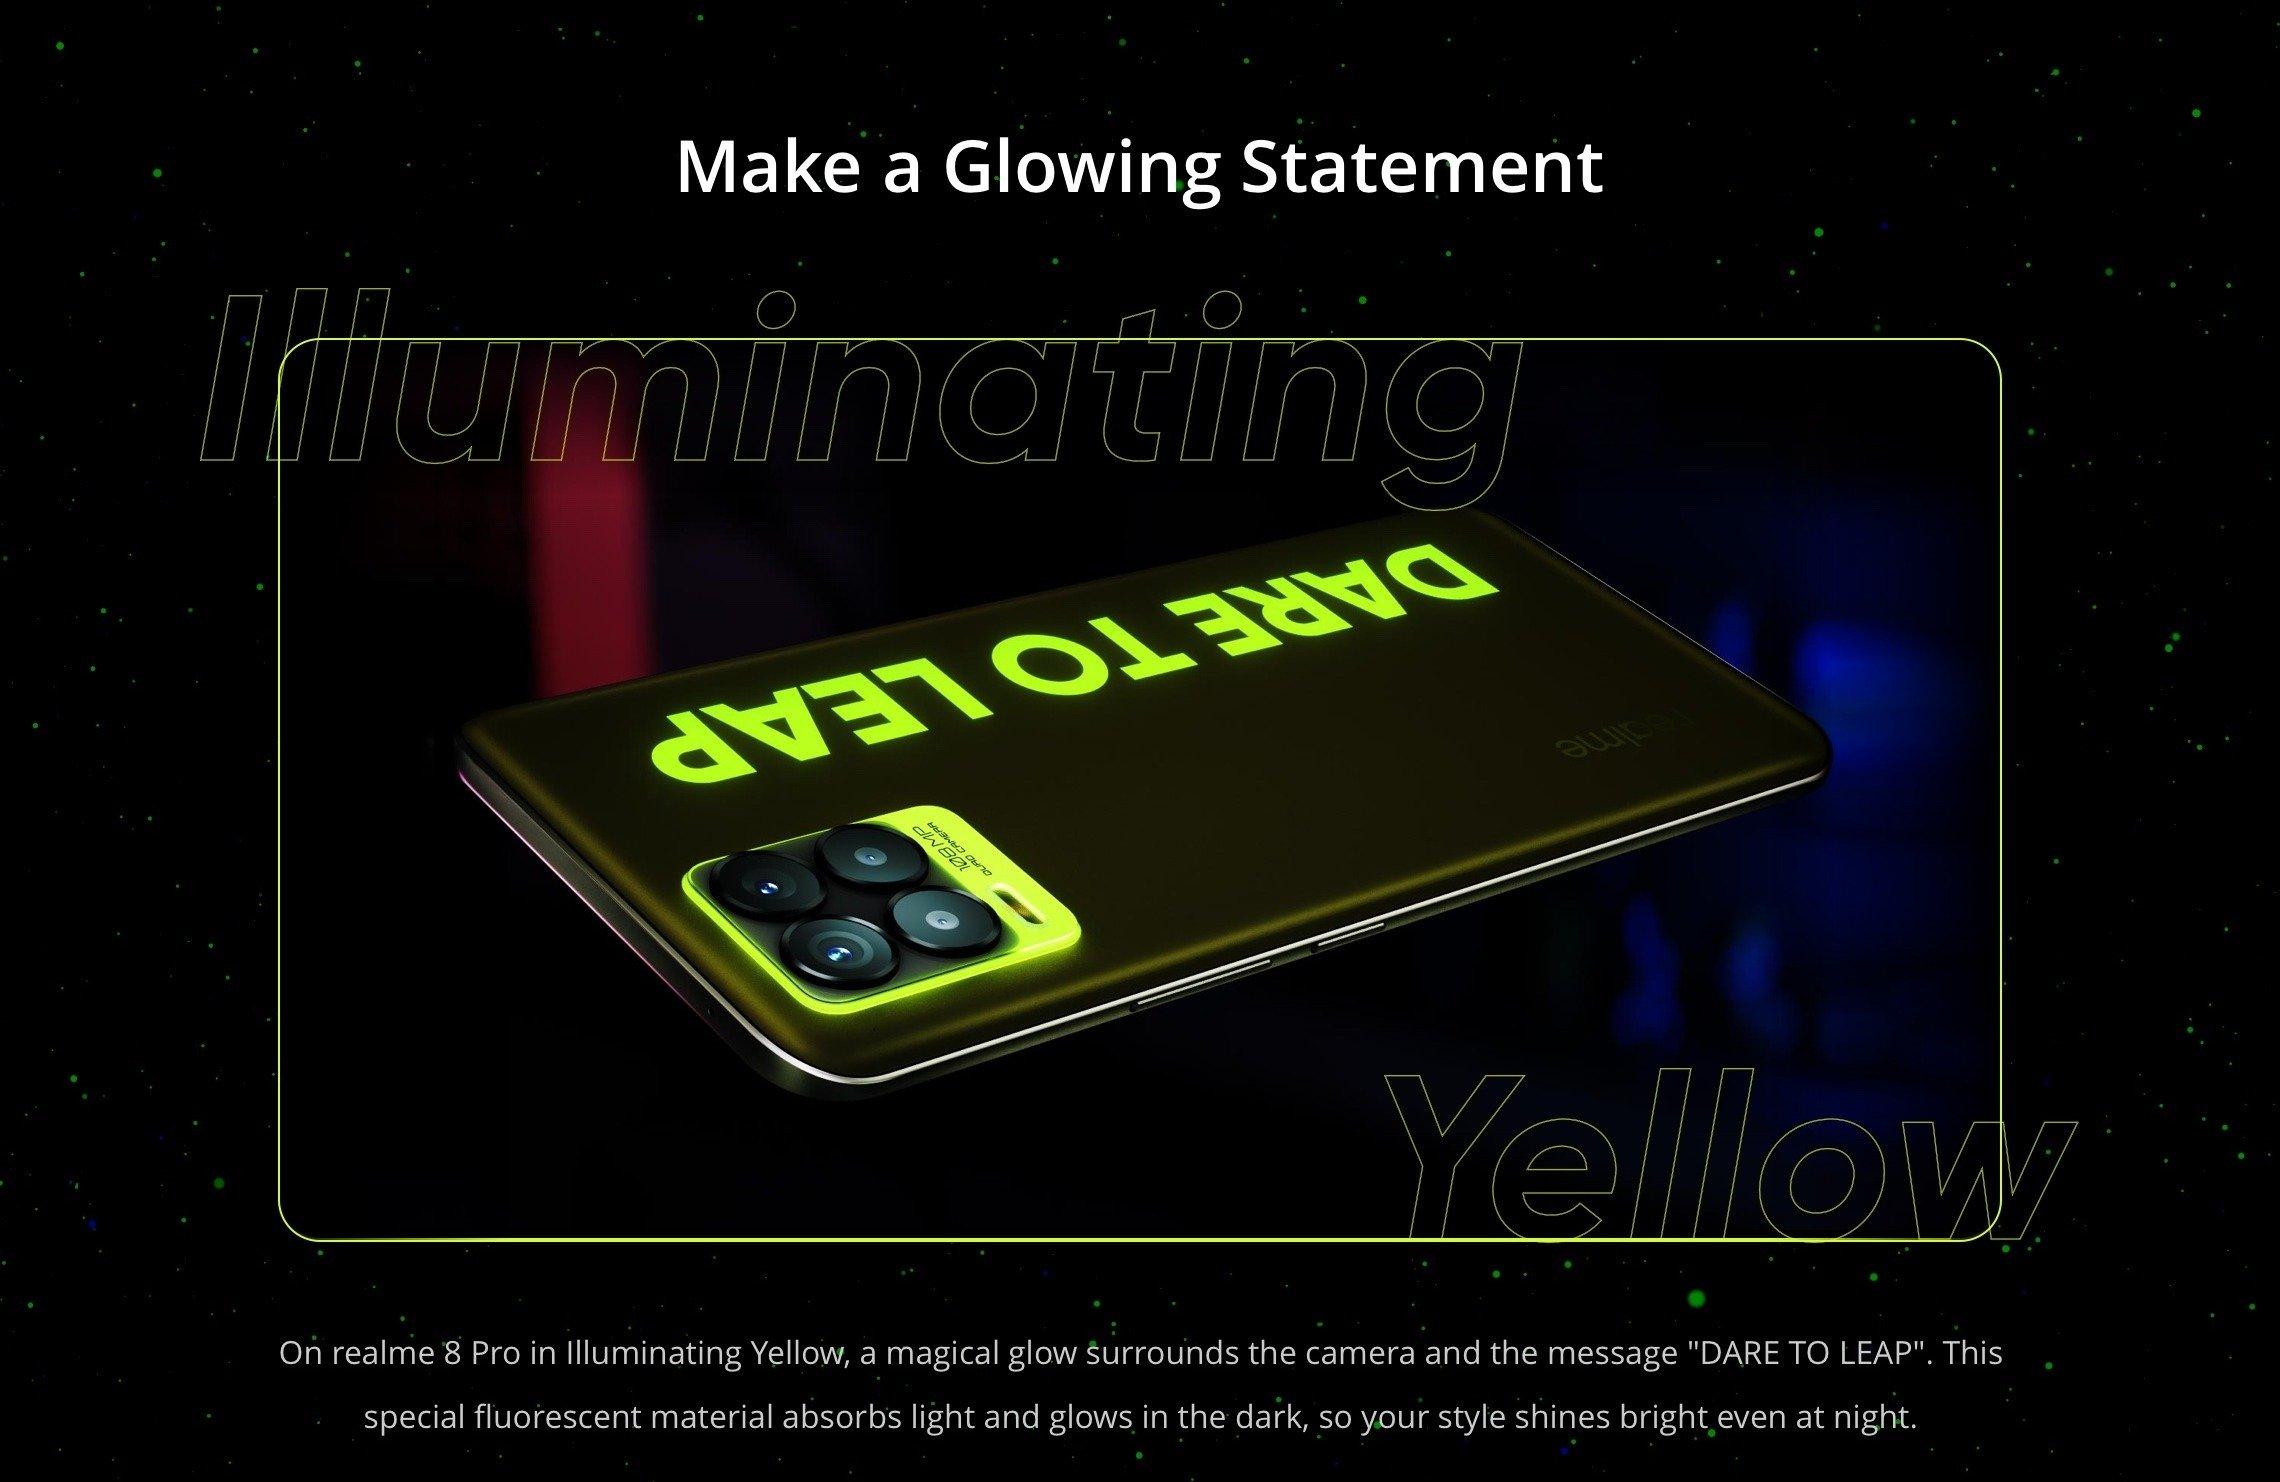 Realme 8 Pro Illuminating Yellow Demo